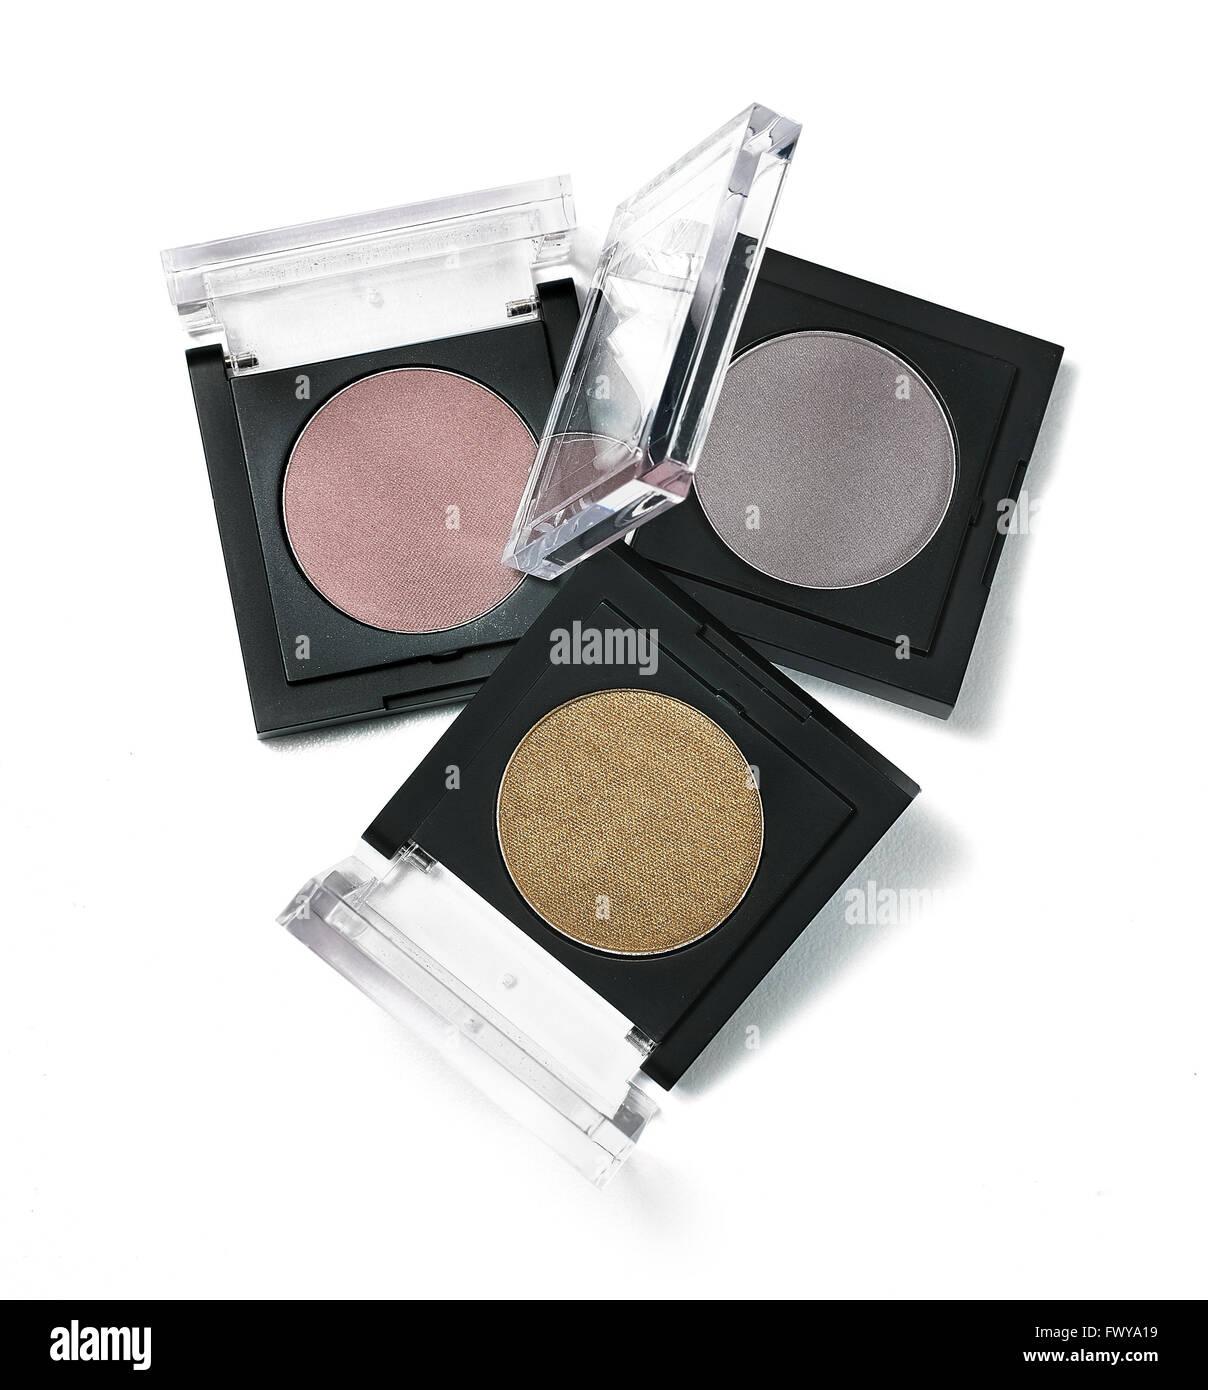 Trio of eyeshadows - Stock Image